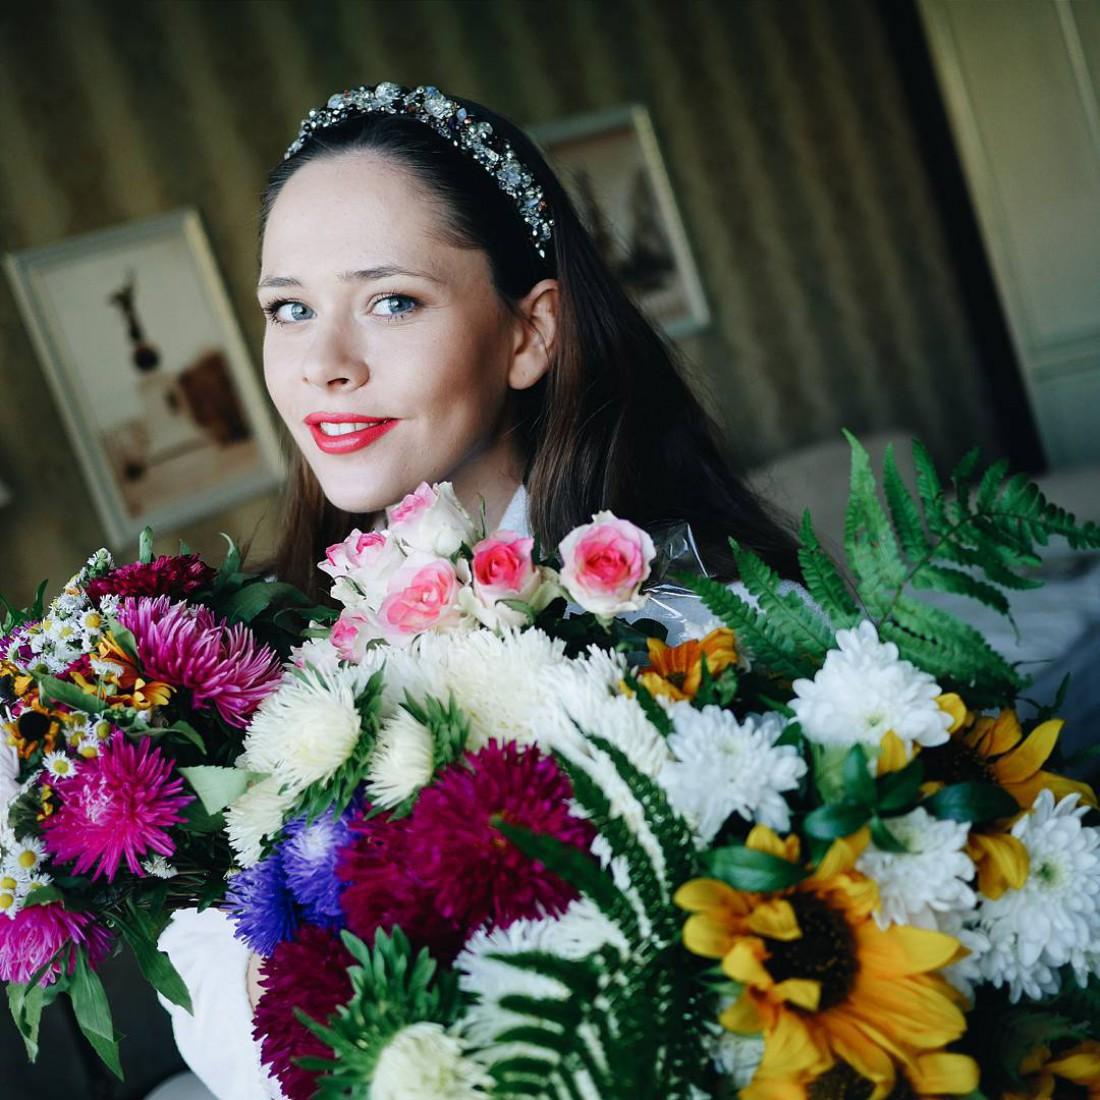 Участница популярного коллектива The Hardkiss Юлия Санина умилила сети семейным снимком